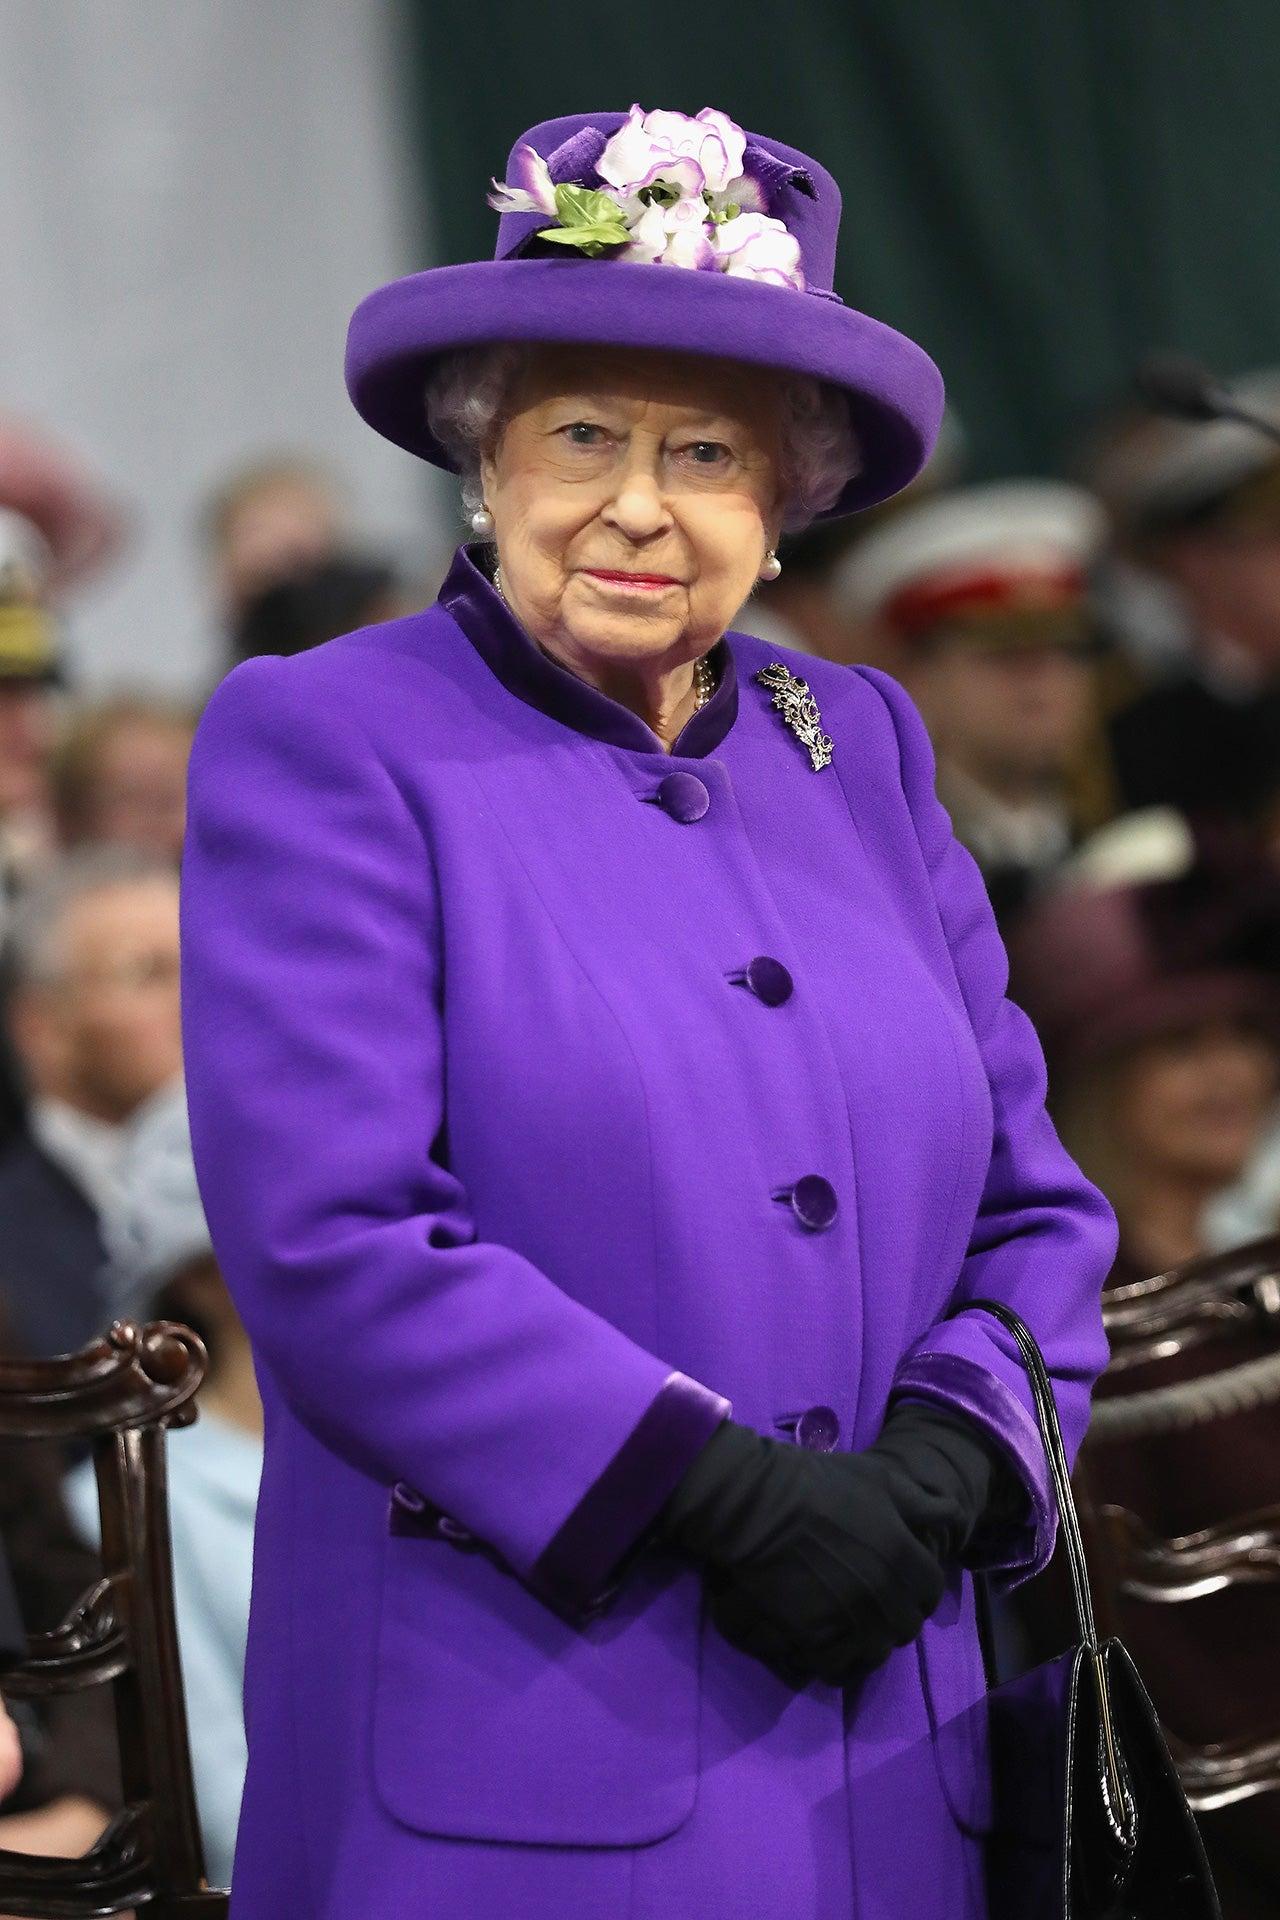 Královna Alžběta II., 2017 Autor: Getty Images